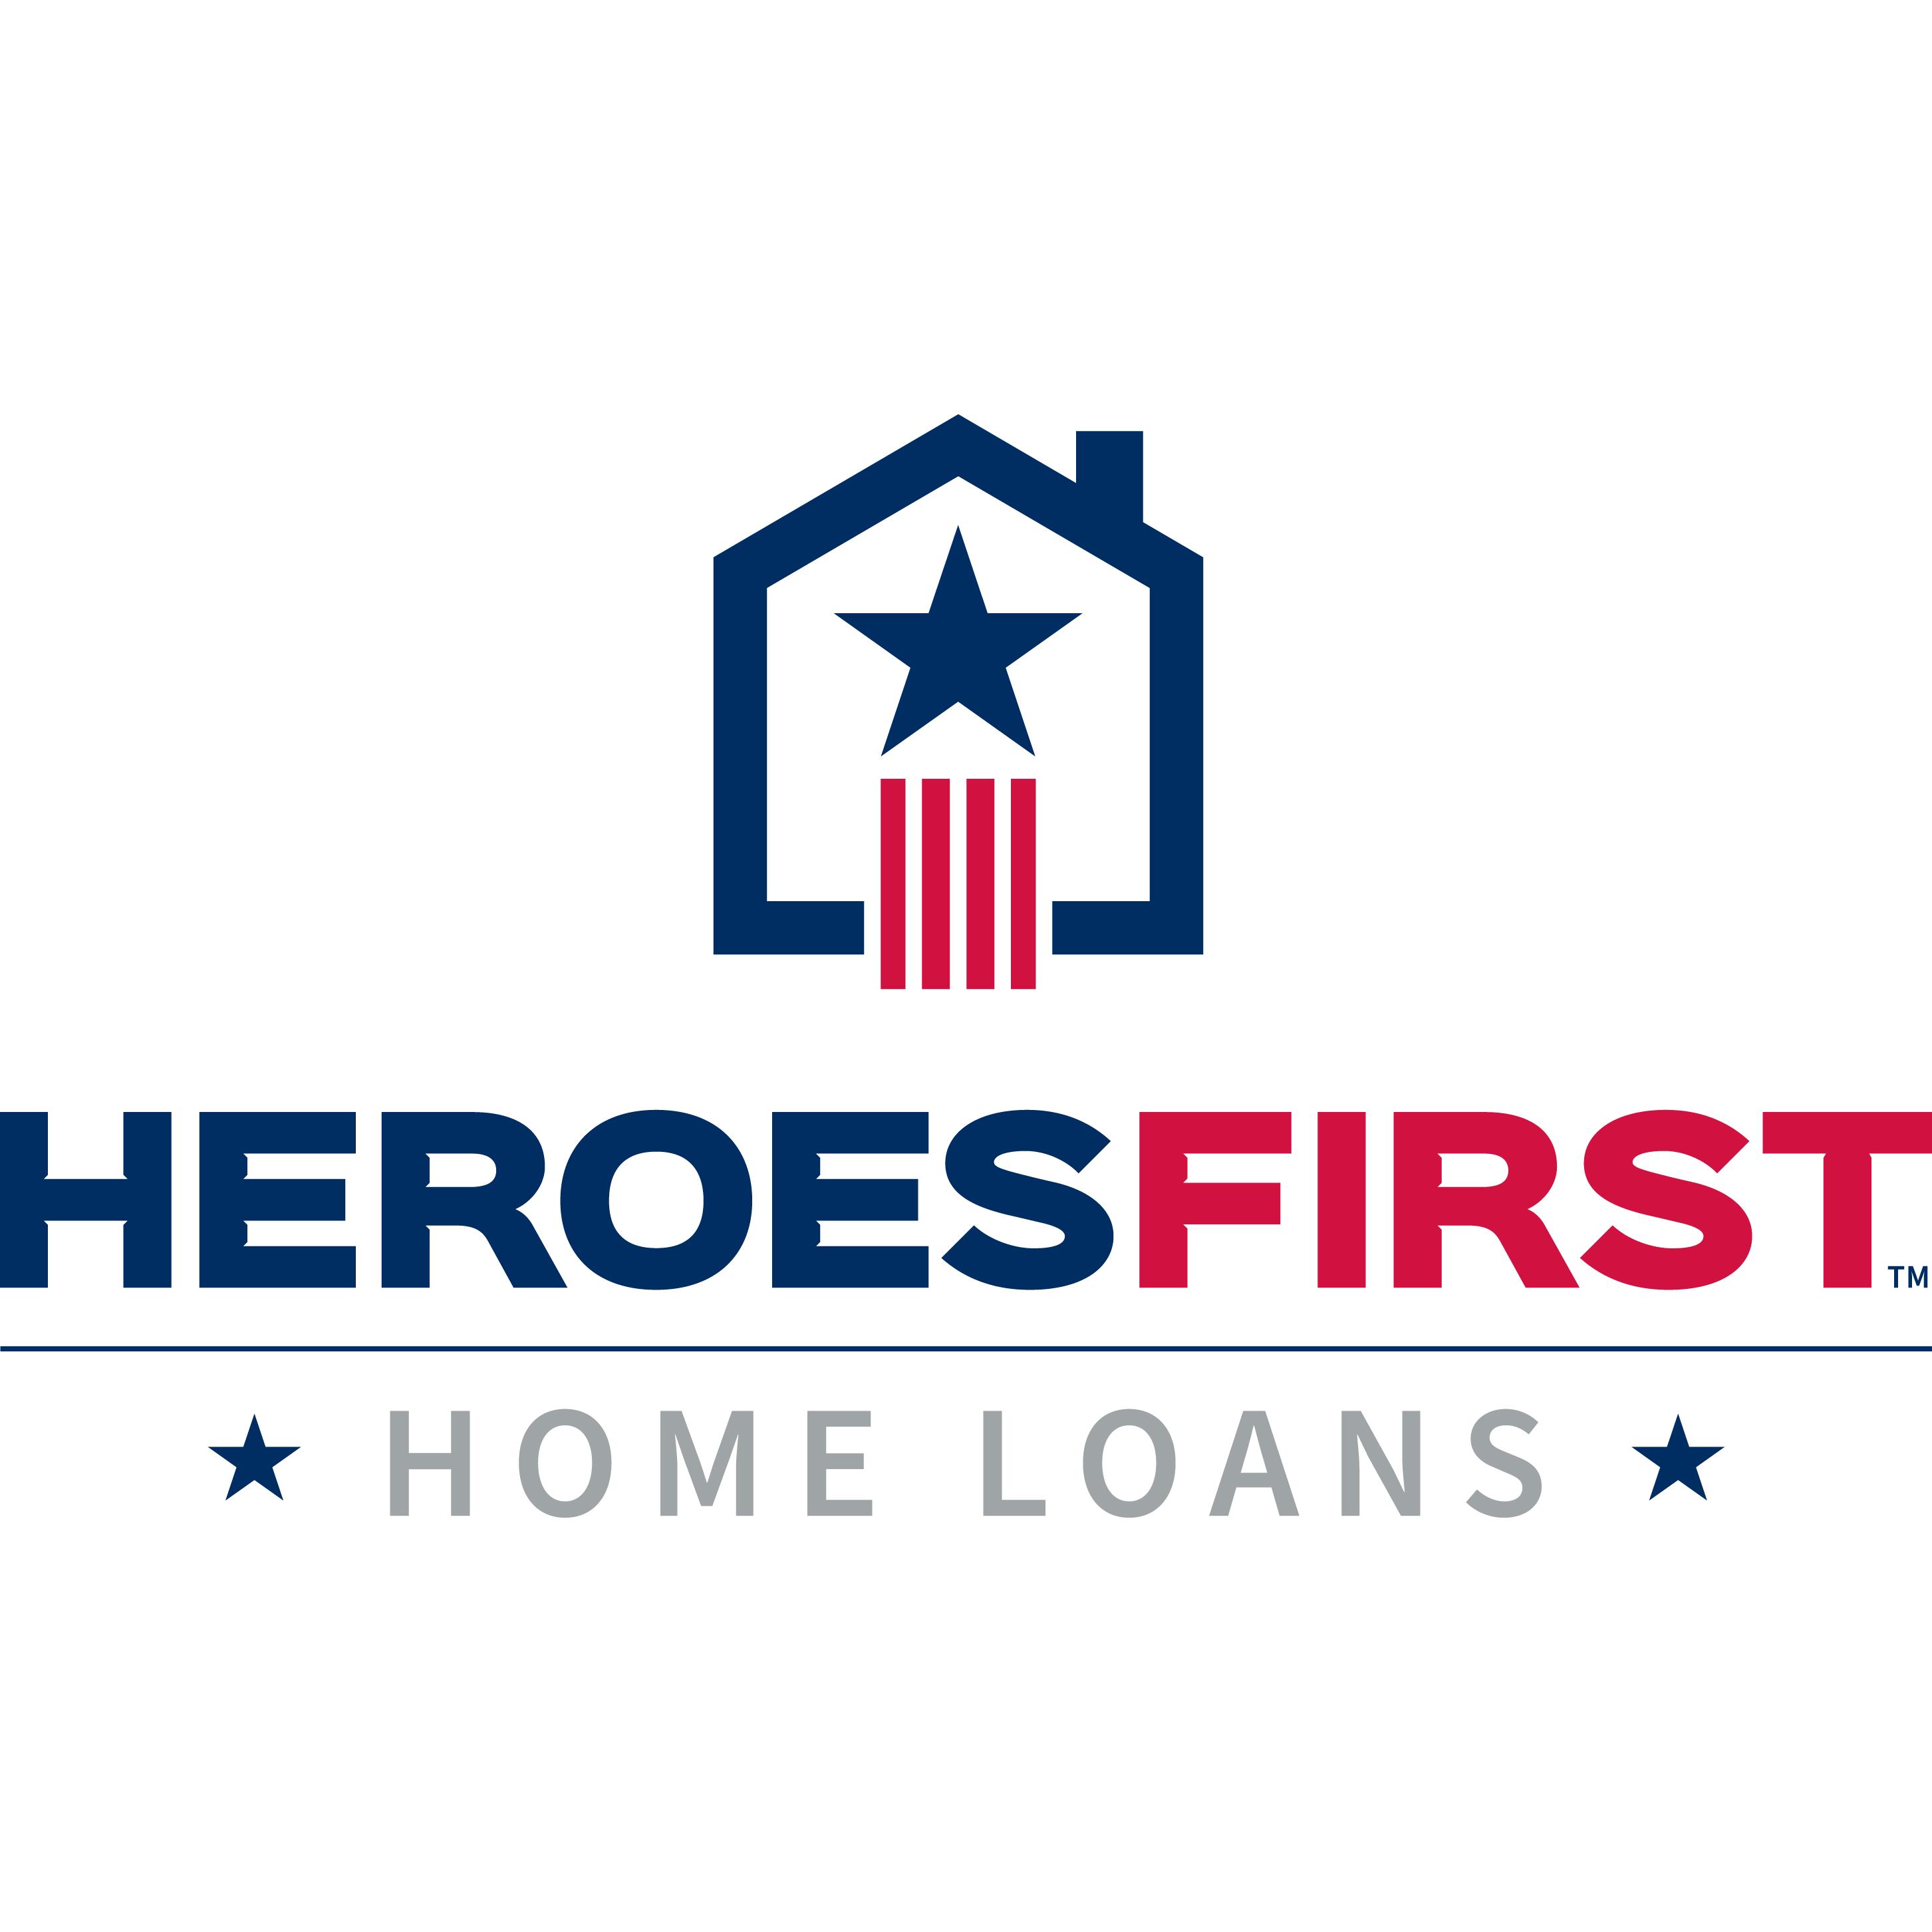 Heroes First Home Loans, NMLS #3001